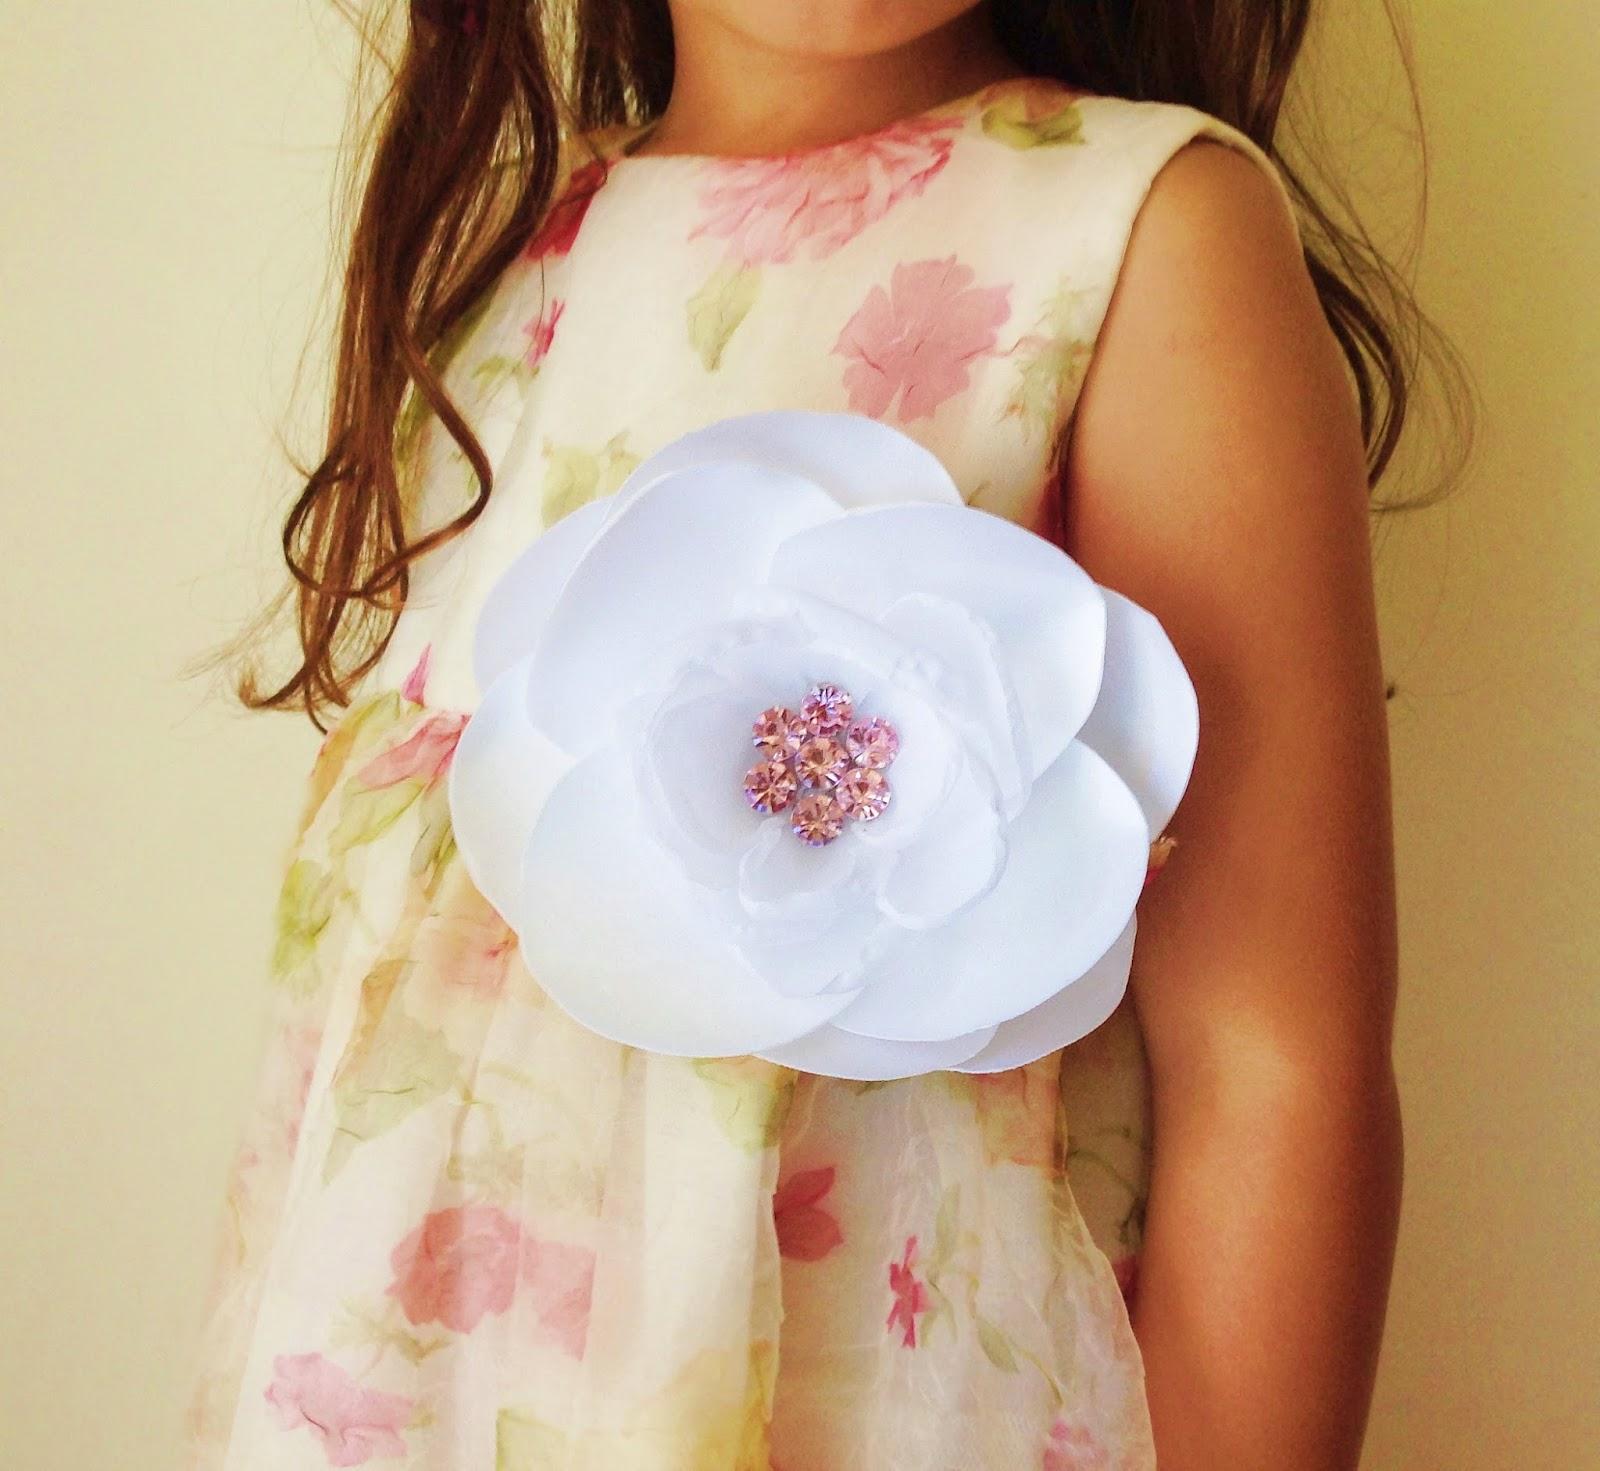 Fabric flowers to apply onto dress